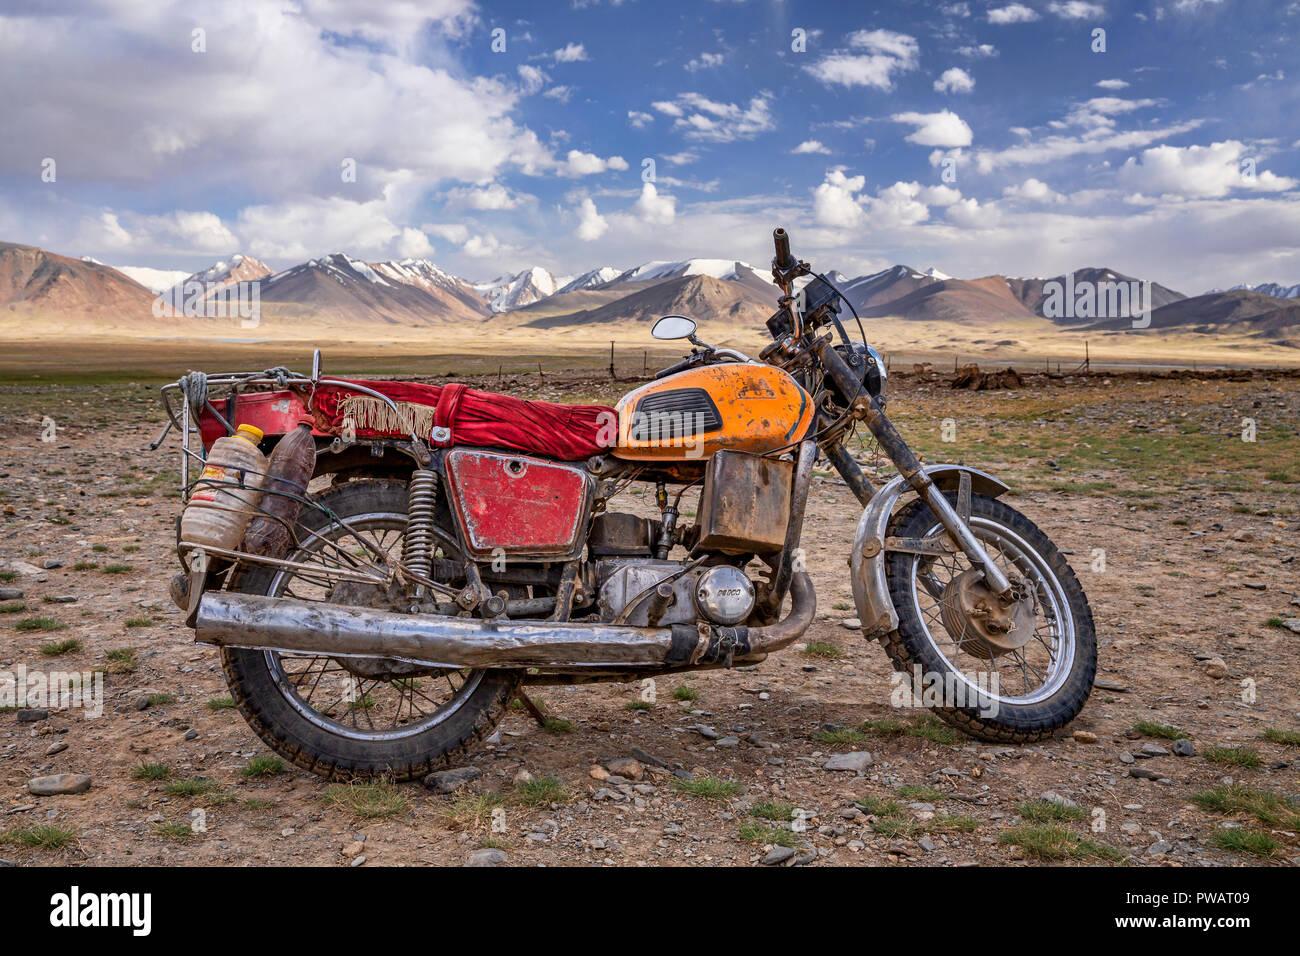 Old Russian HHH motorcycle with the Afghan Great Pamir in the background, Kara Jilga, Pamir Mountains, Gorno-Badakhshan, Tajikistan. - Stock Image